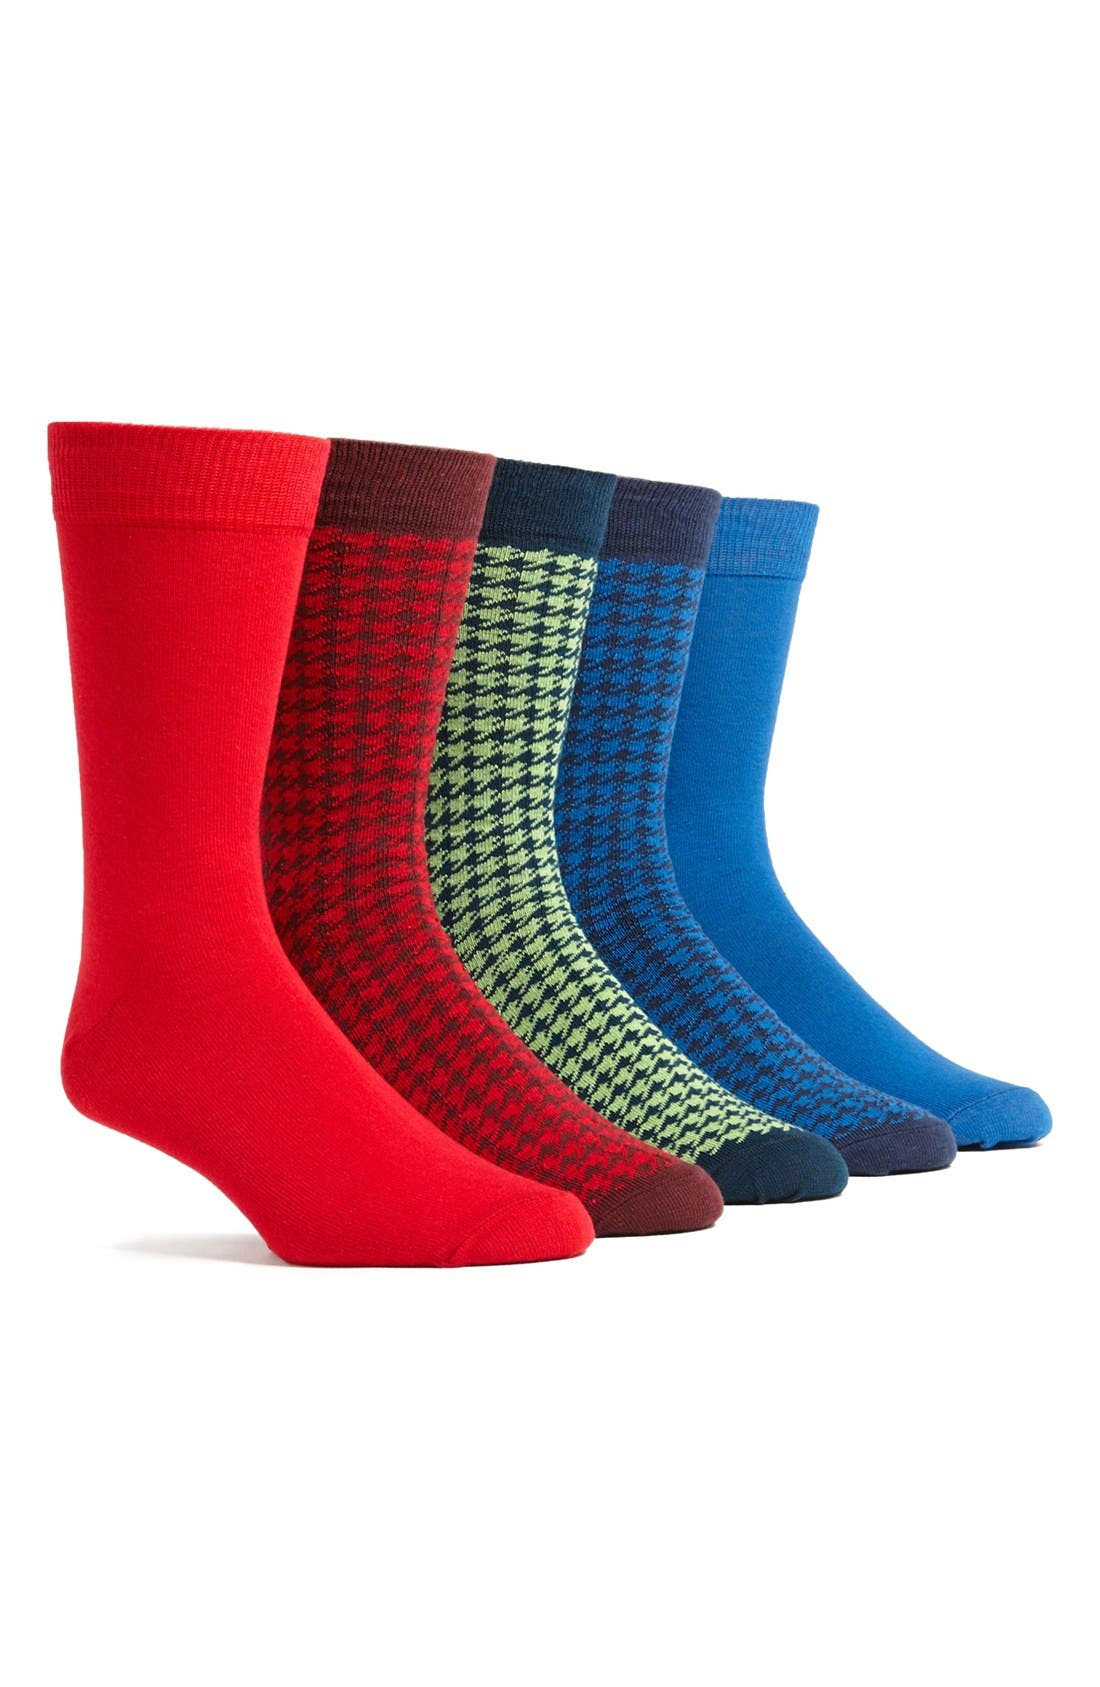 Alternate Image 1 Selected - Topman Houndstooth Pattern Socks (5-Pack)